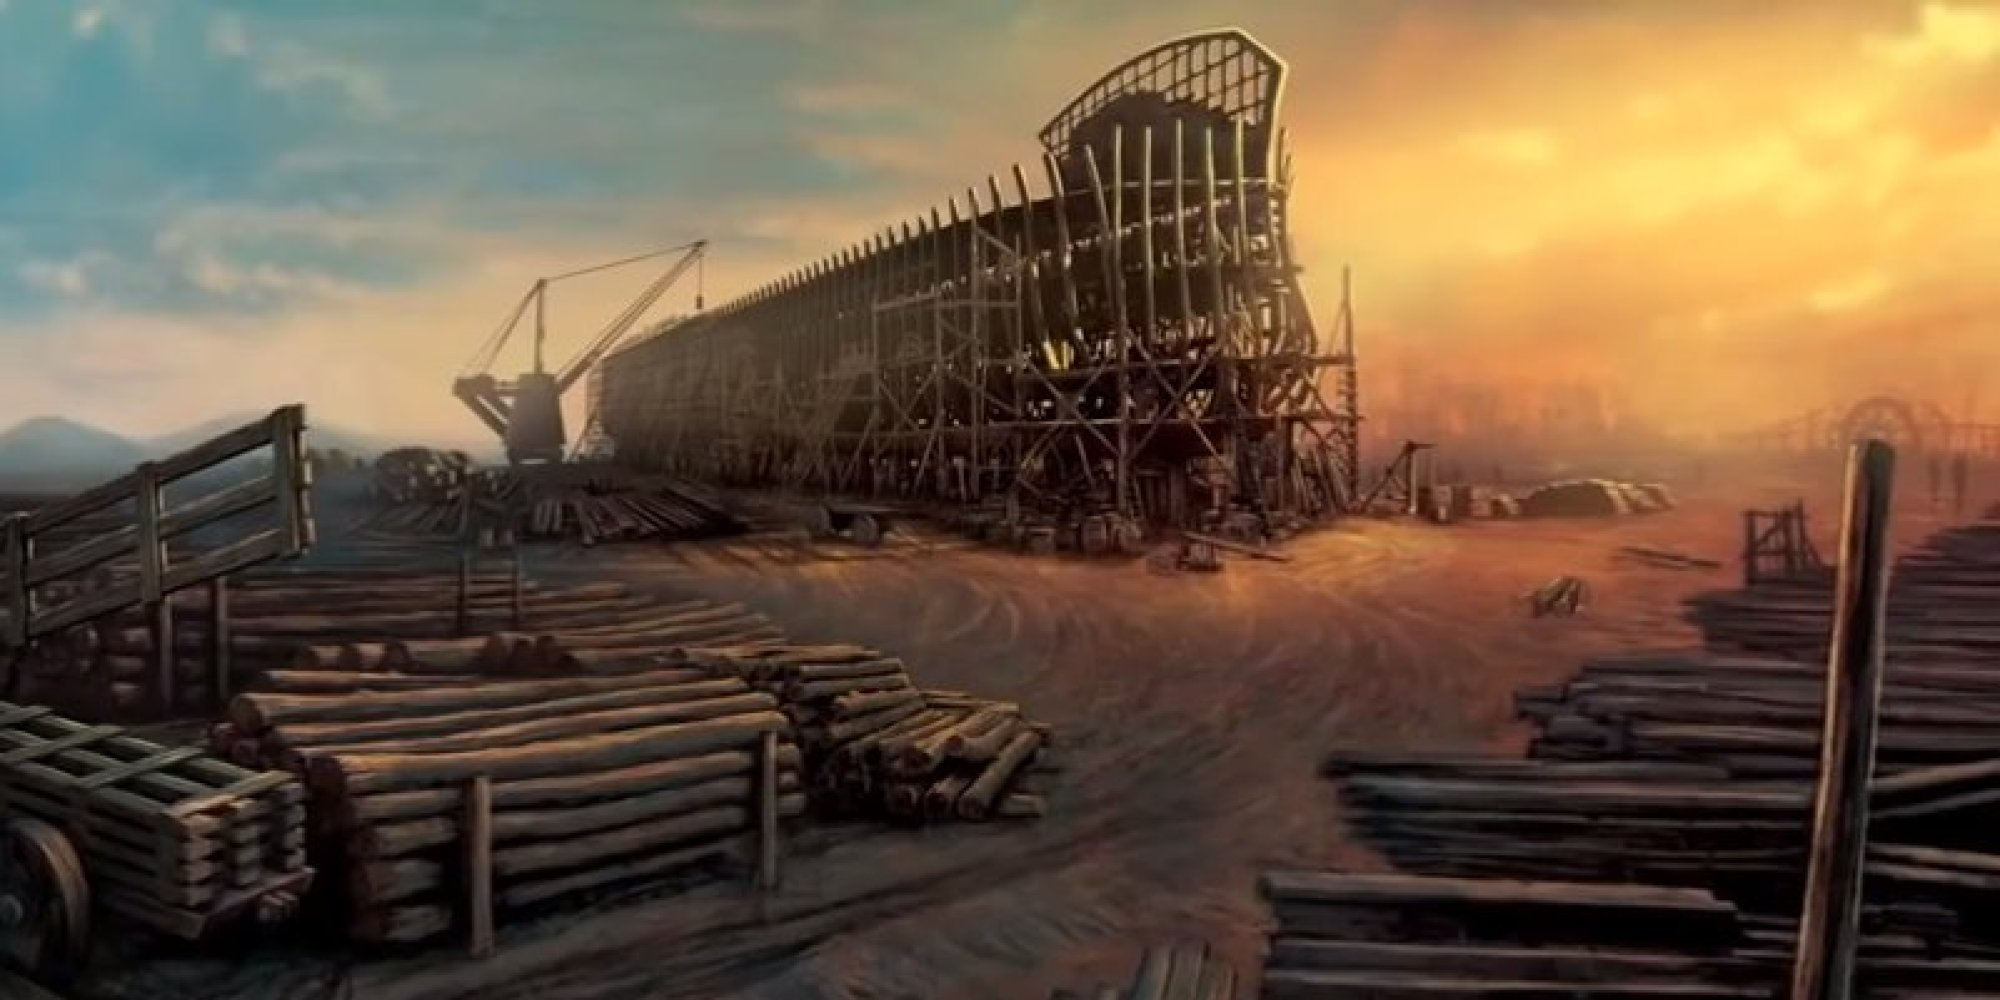 Ken Ham Can Now Build Noahs Ark Thanks To Bill Nye